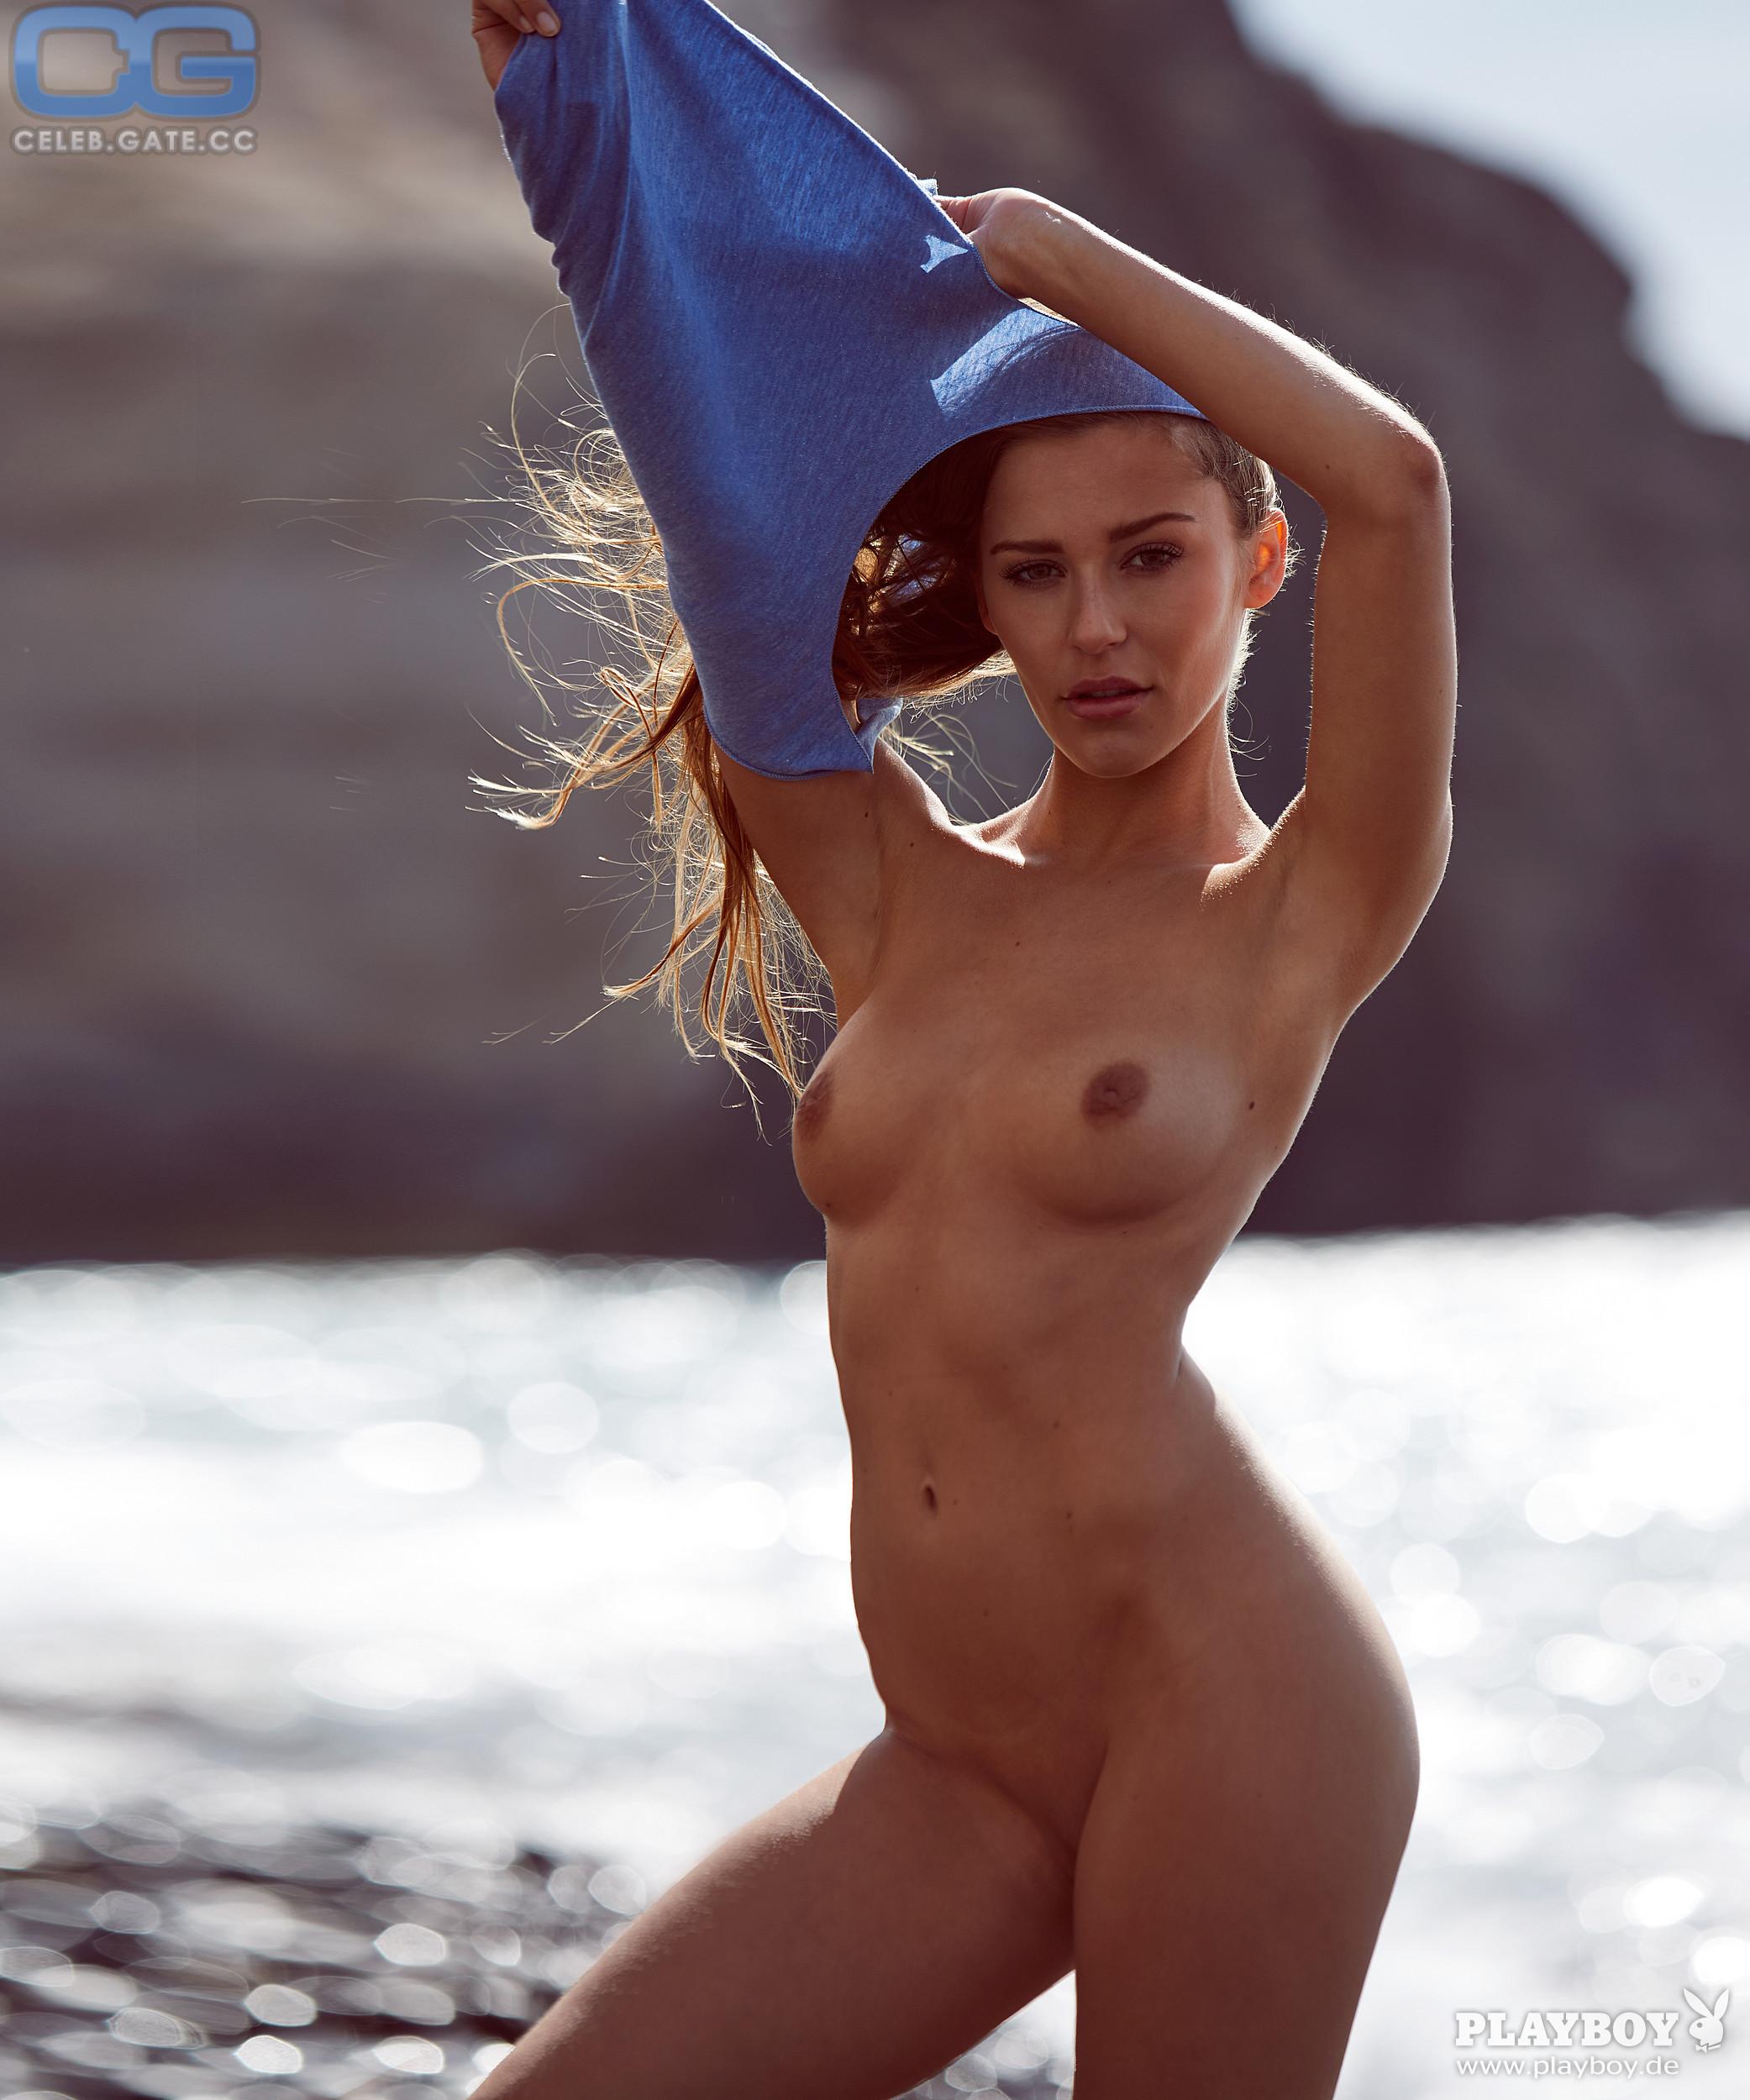 Levina nackt kristina playboy Playboy Germany